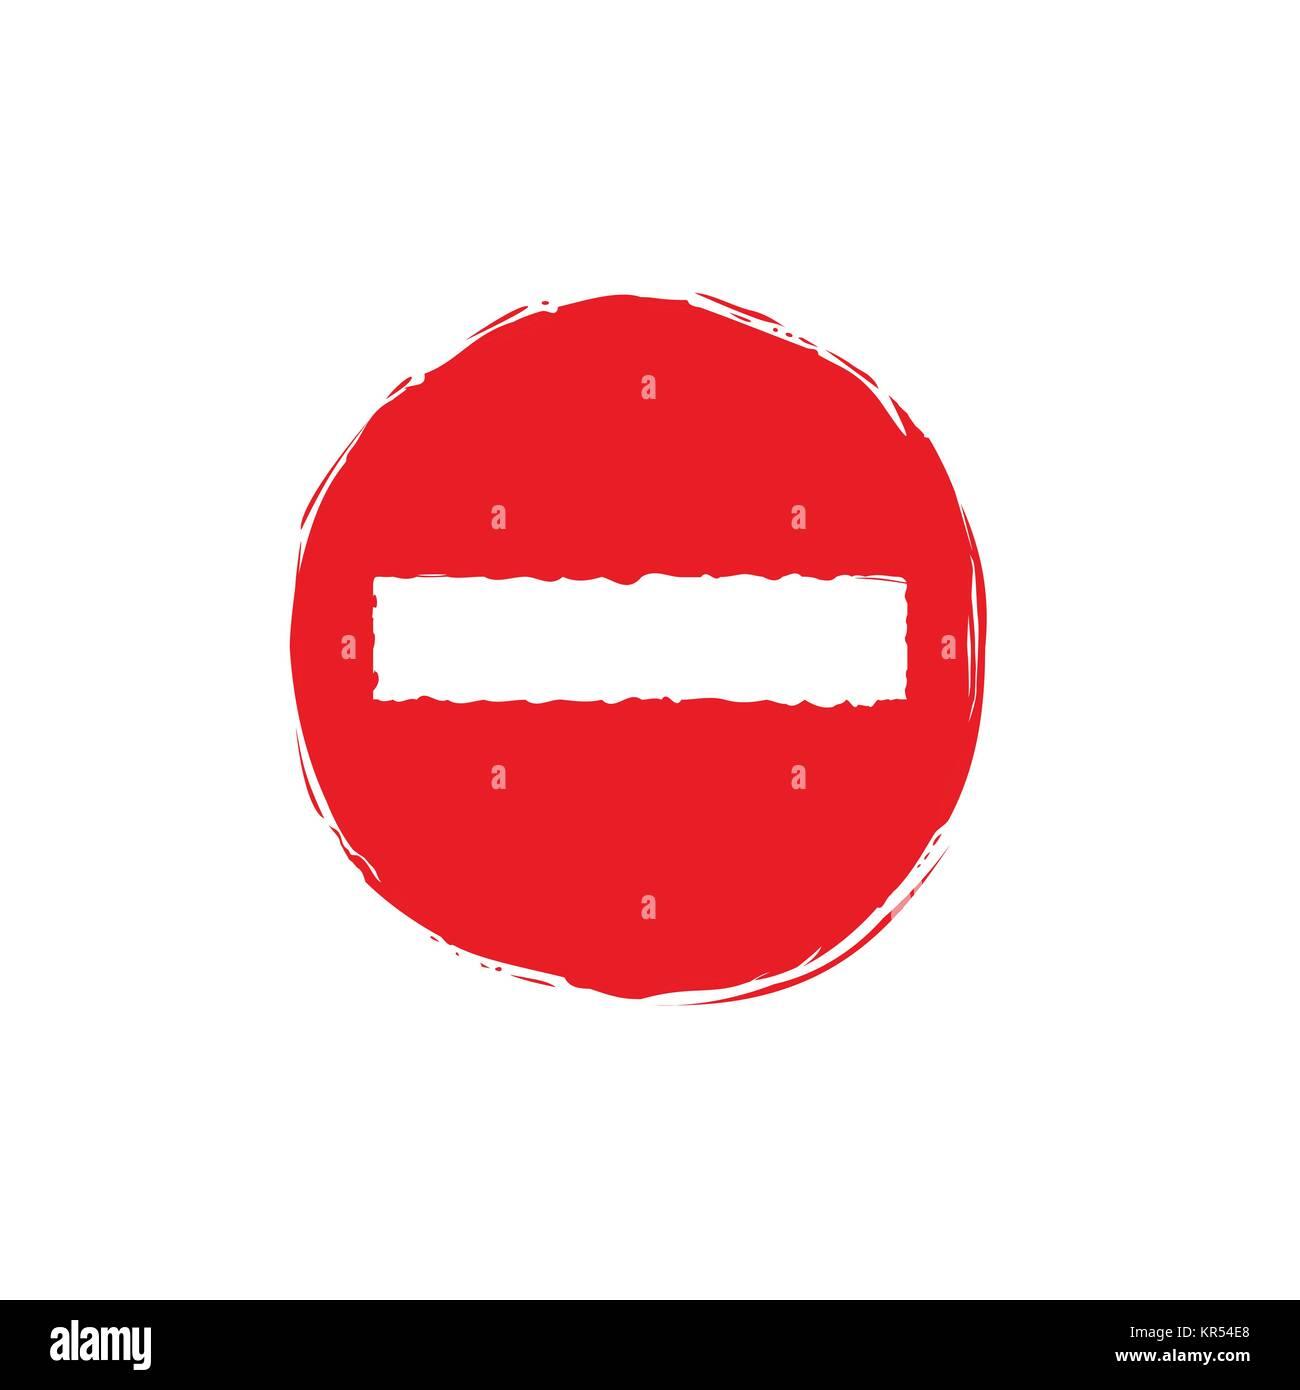 Stop symbol illustration - Stock Image